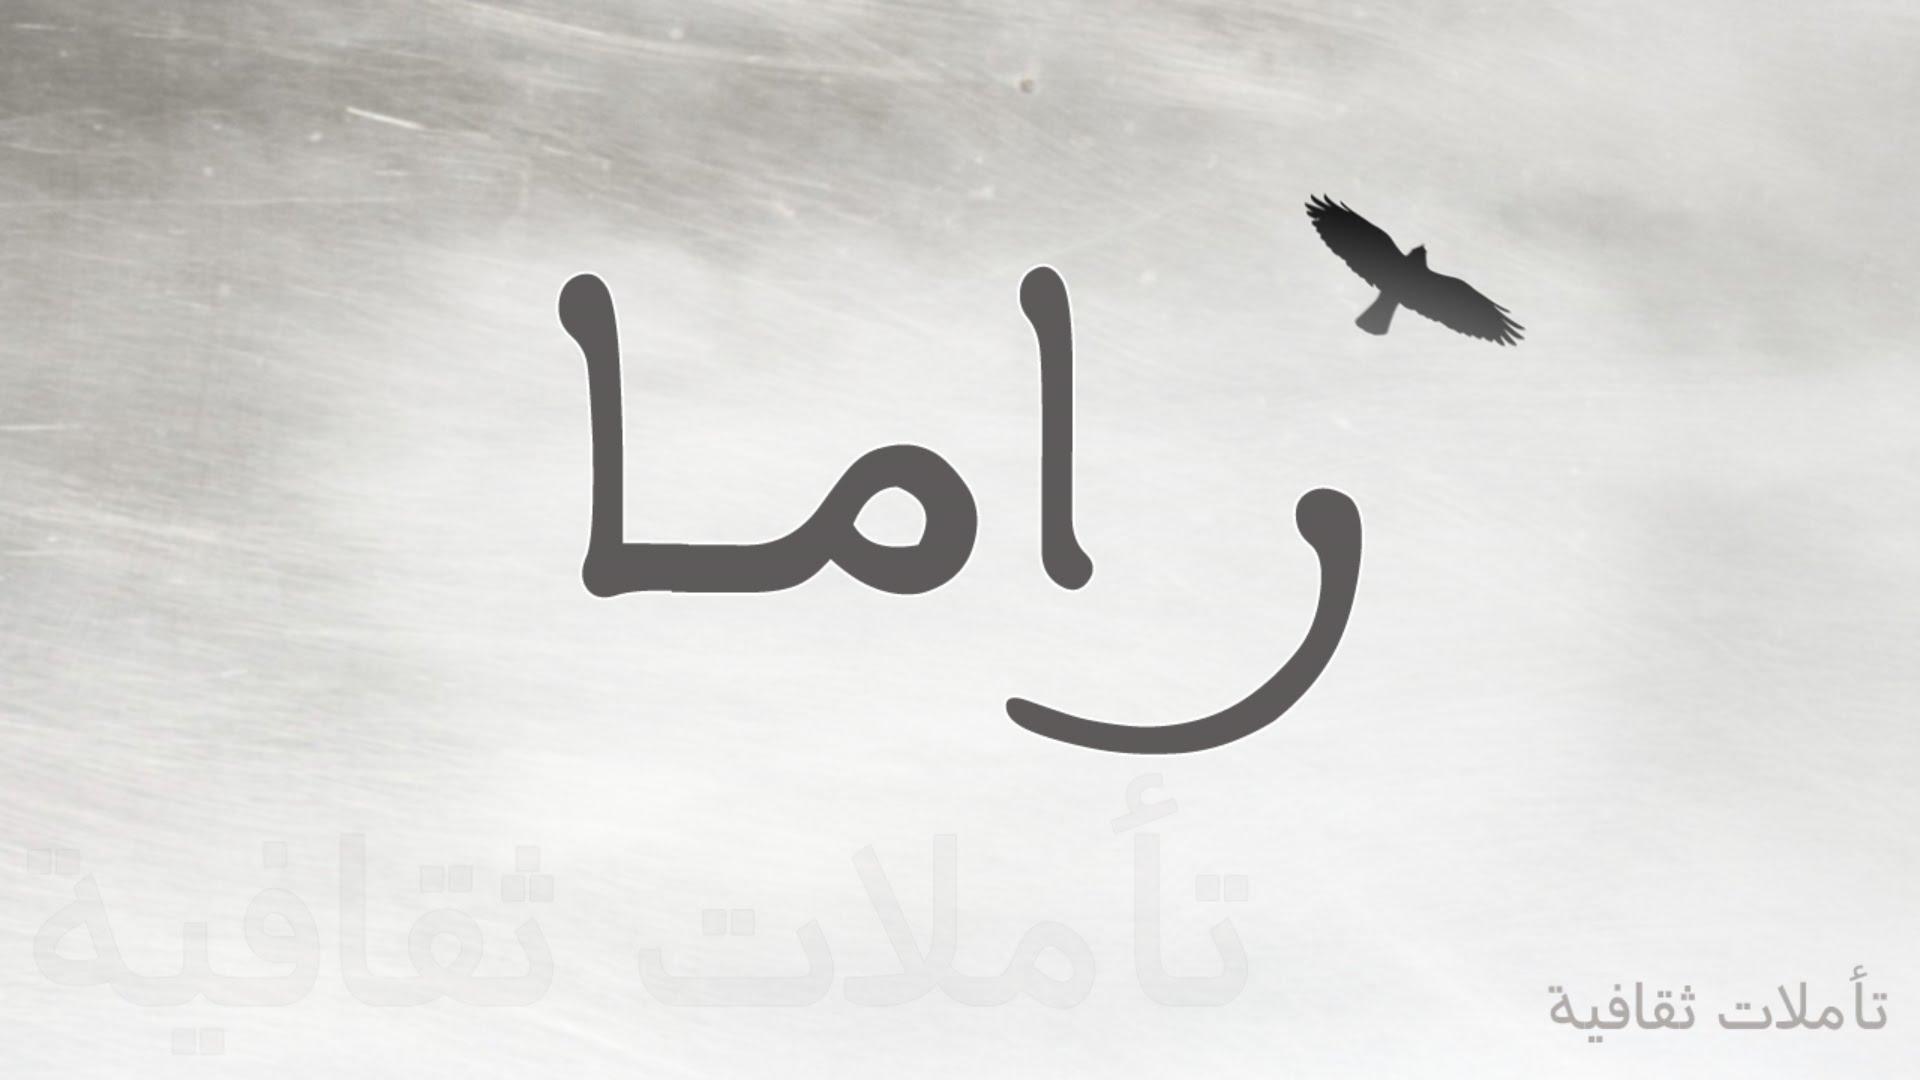 بالصور معنى اسم راما , اسماء قليله الانتشار 6459 1